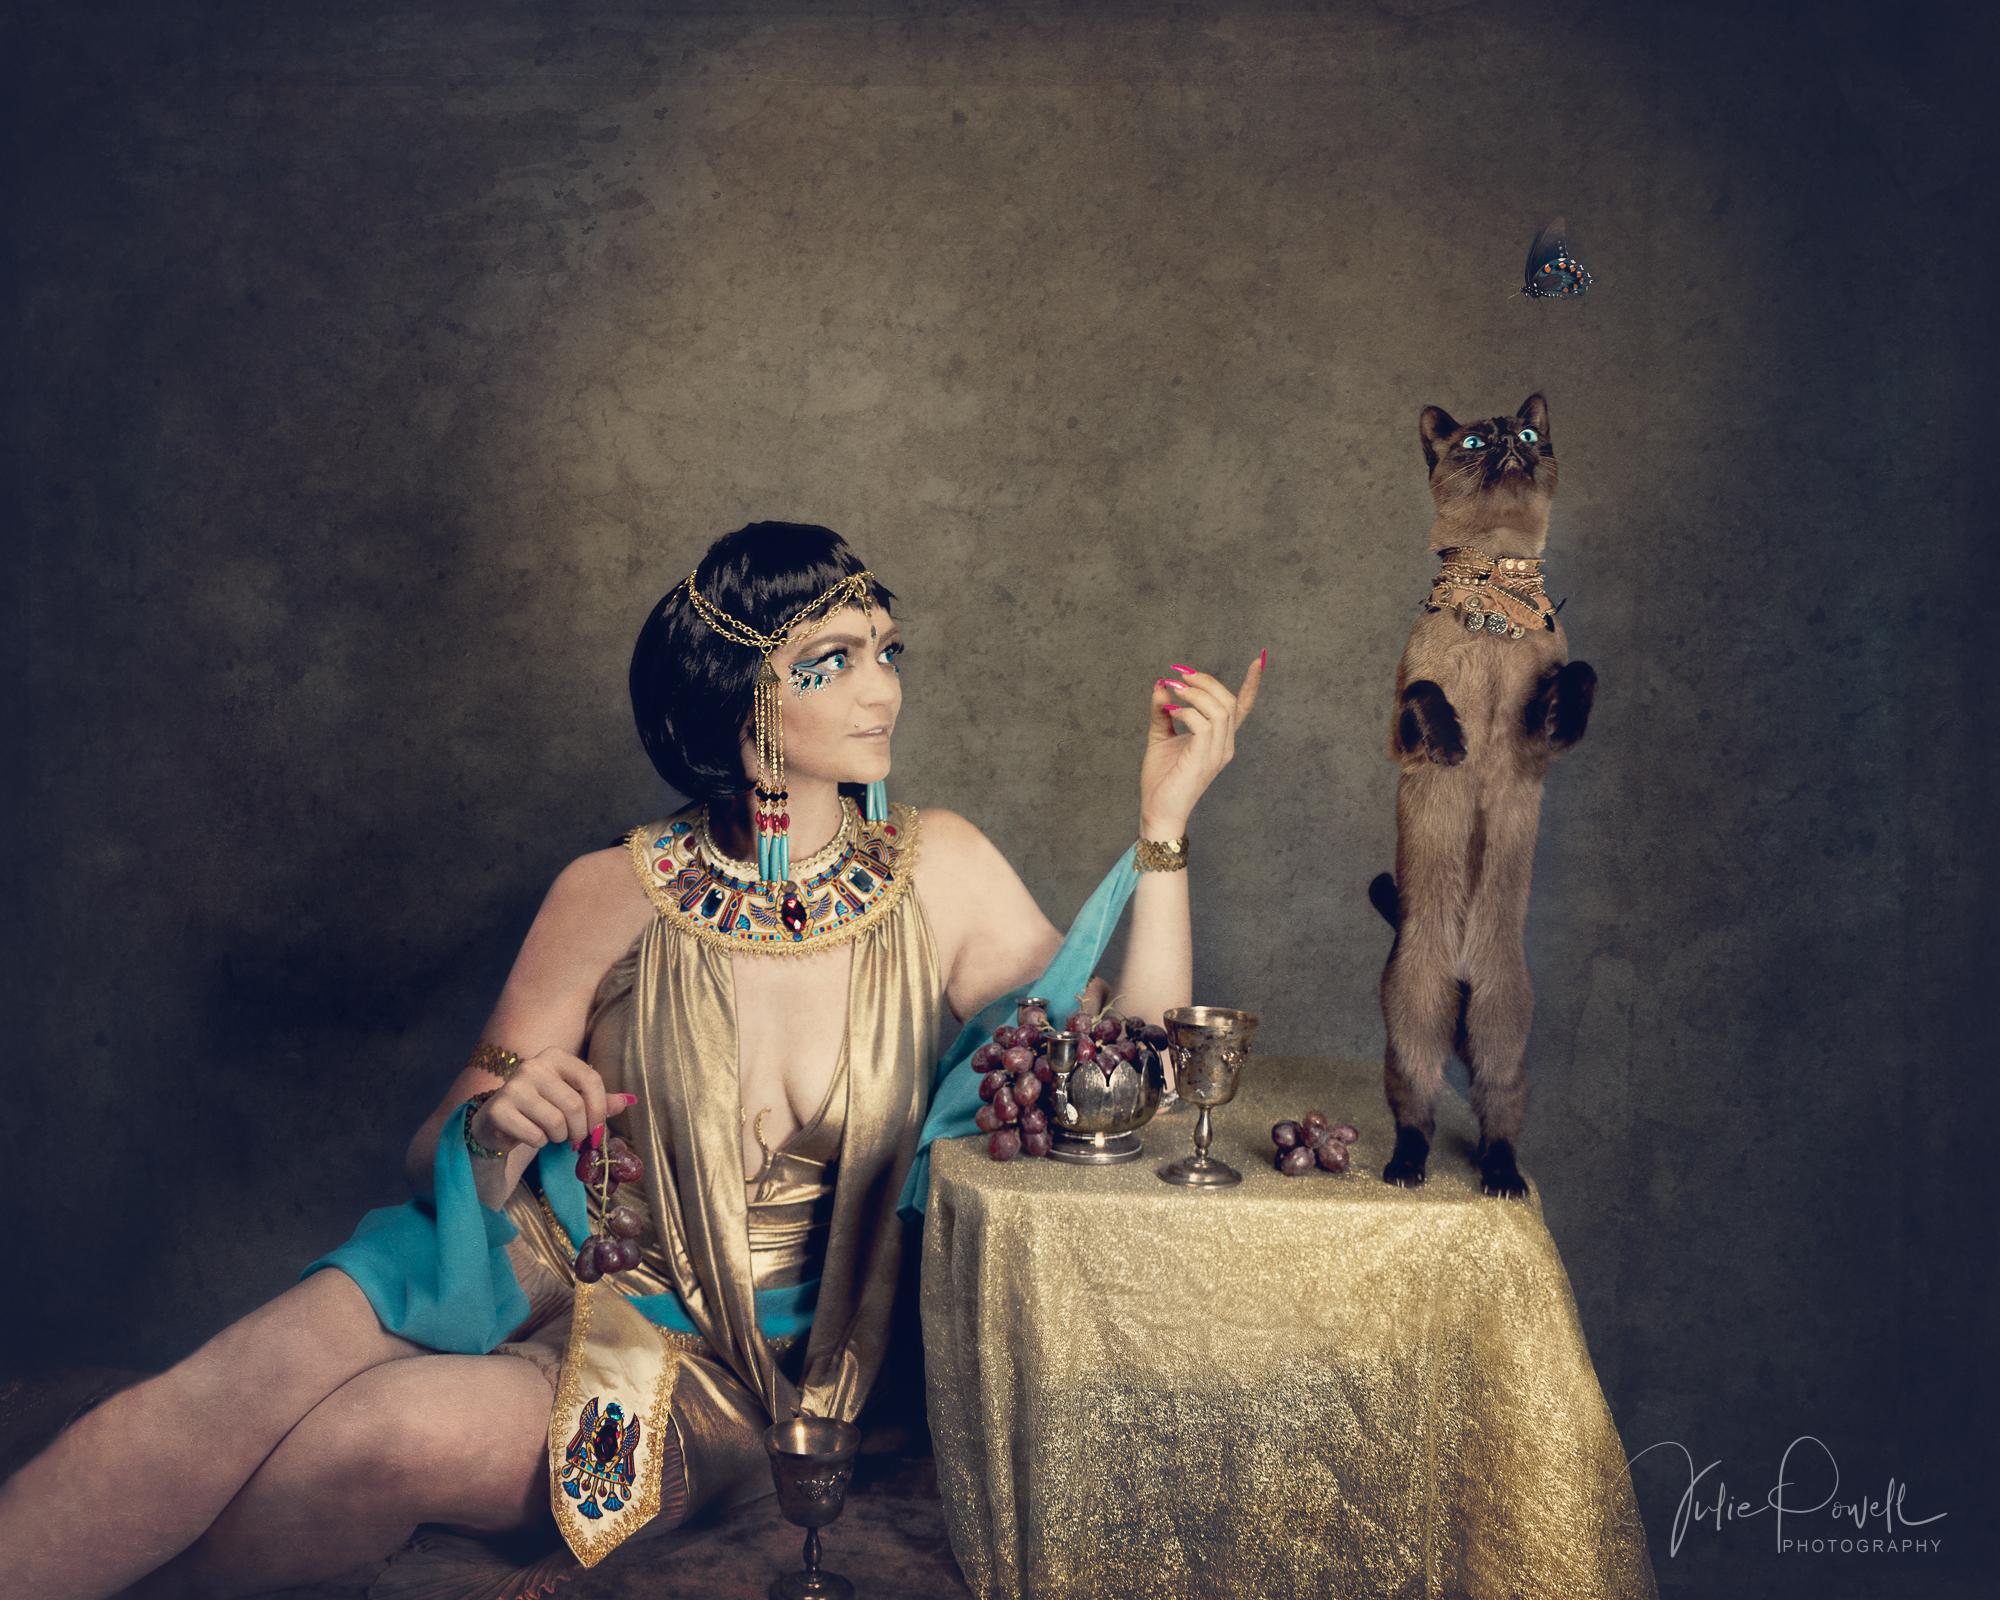 Julie Powell_Cleo-9.jpg